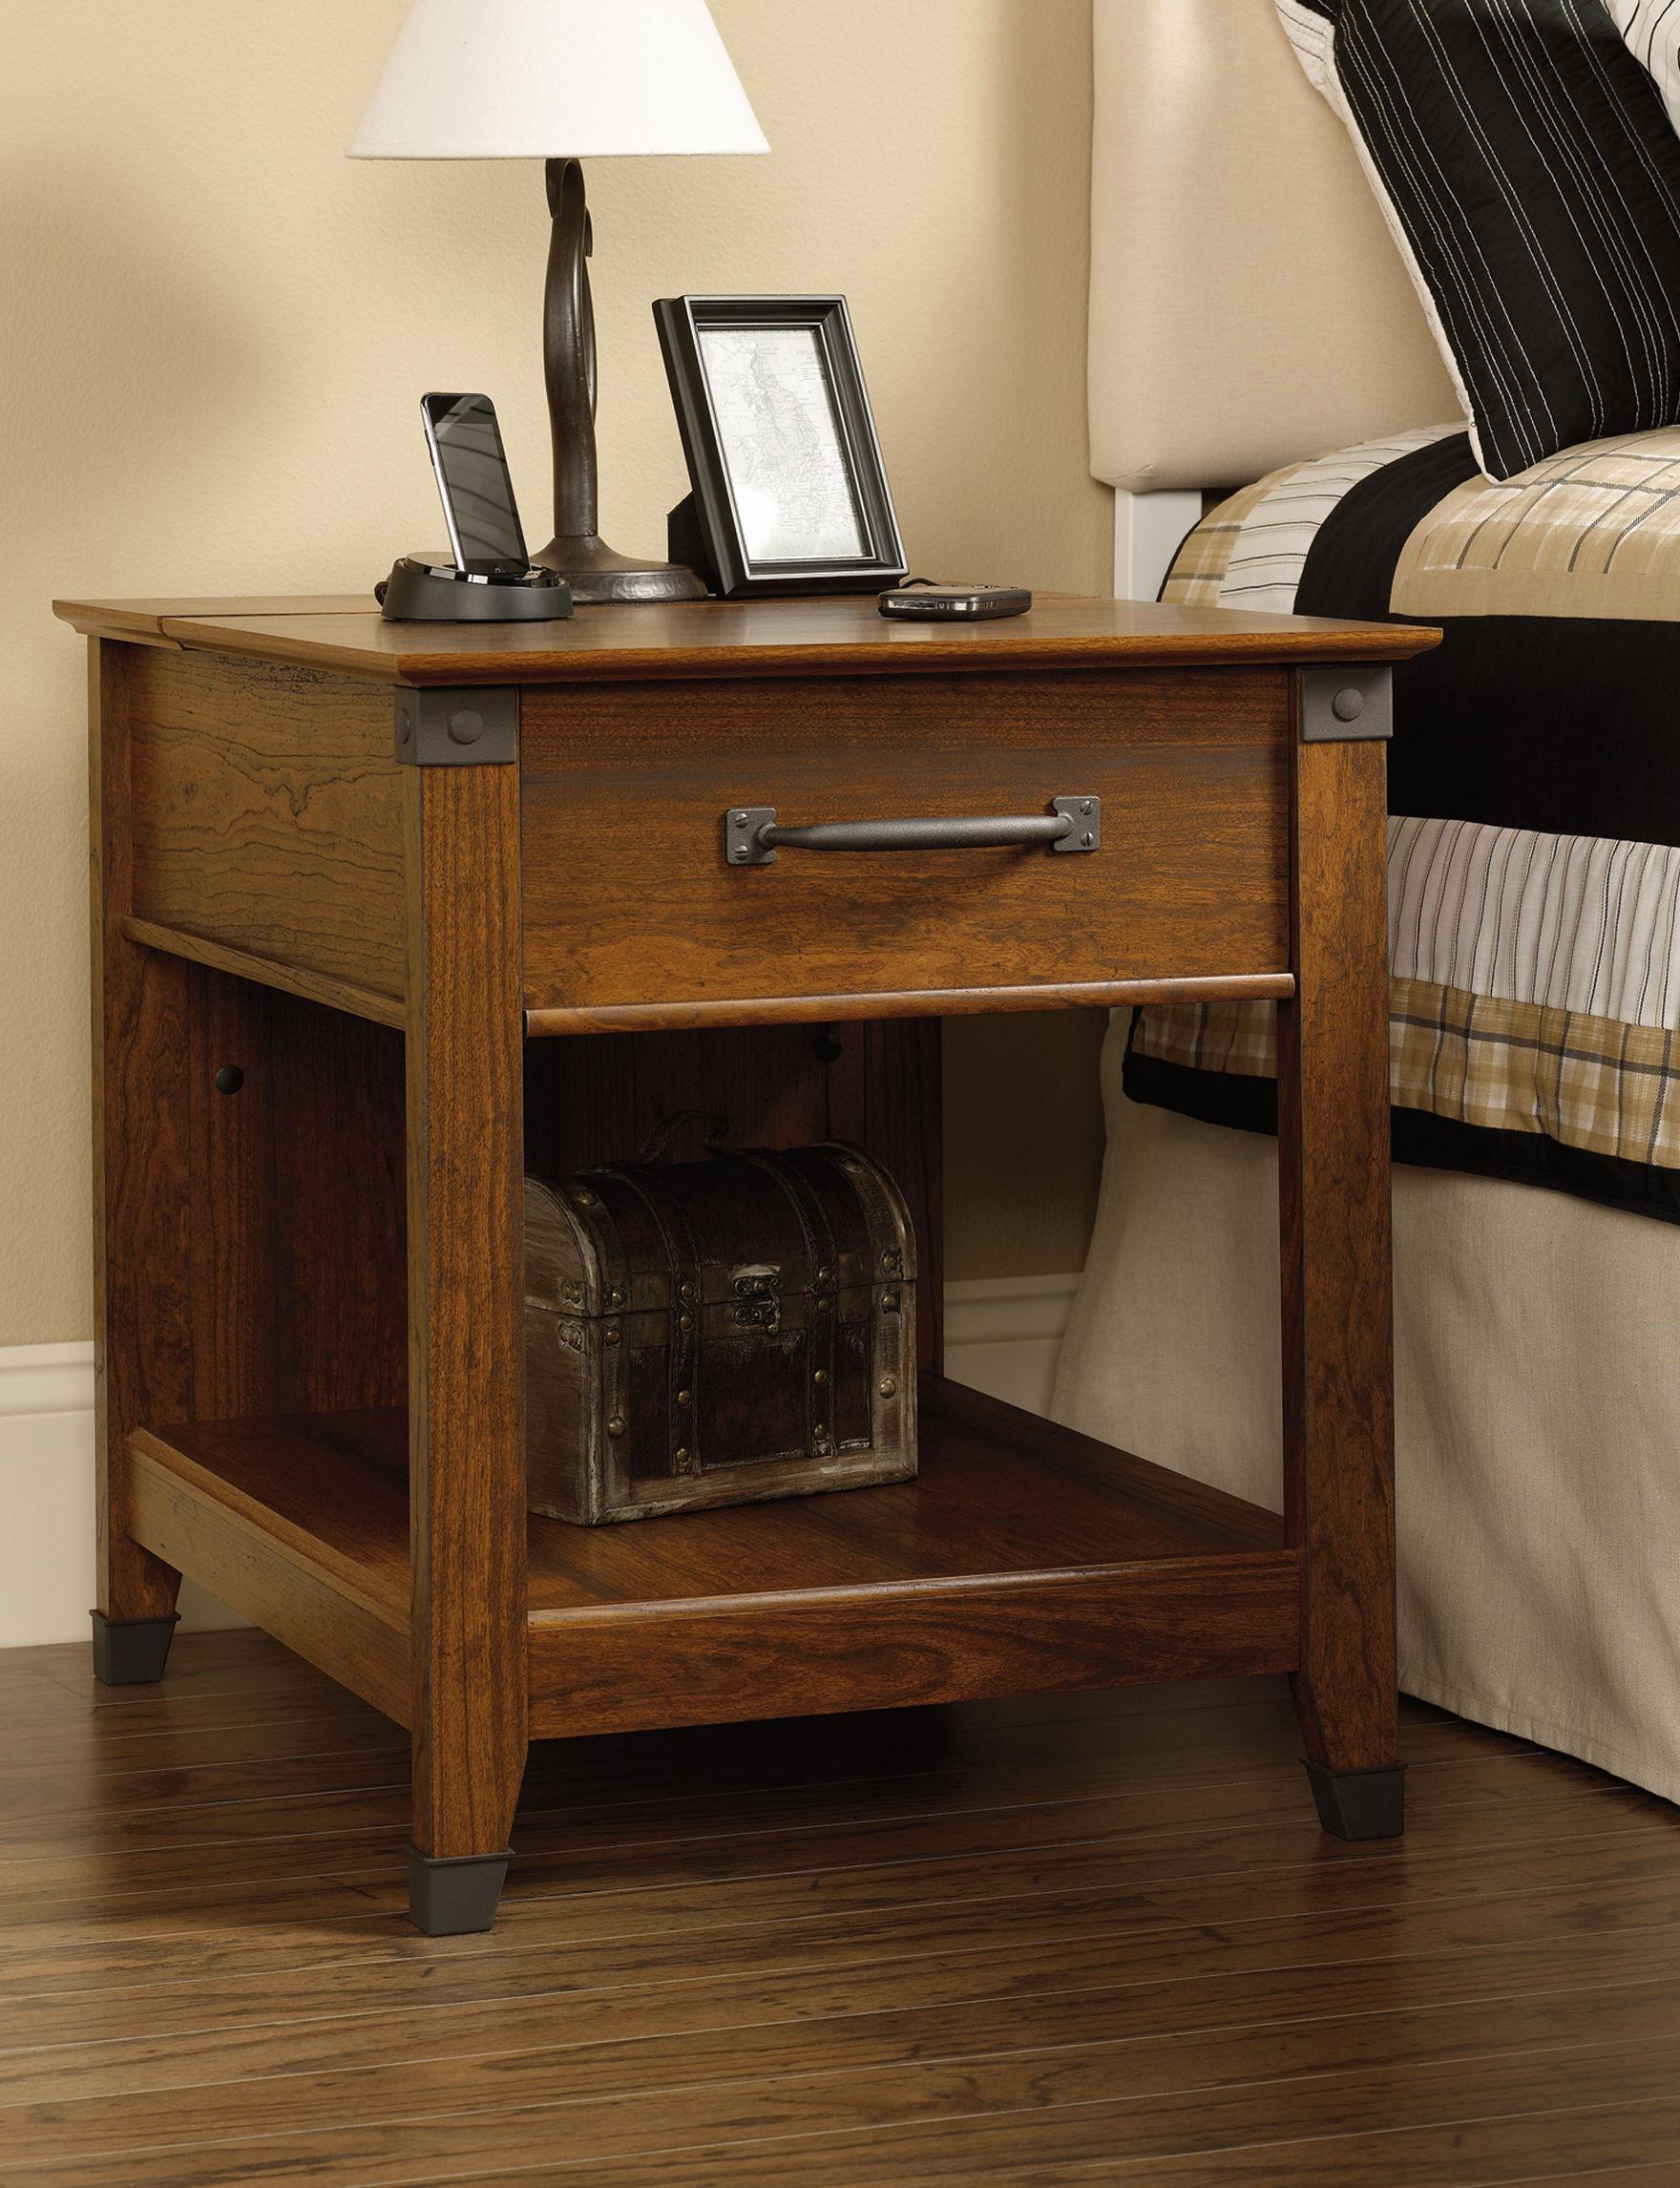 Sauder Brown Accent & End Tables Living Room Furniture